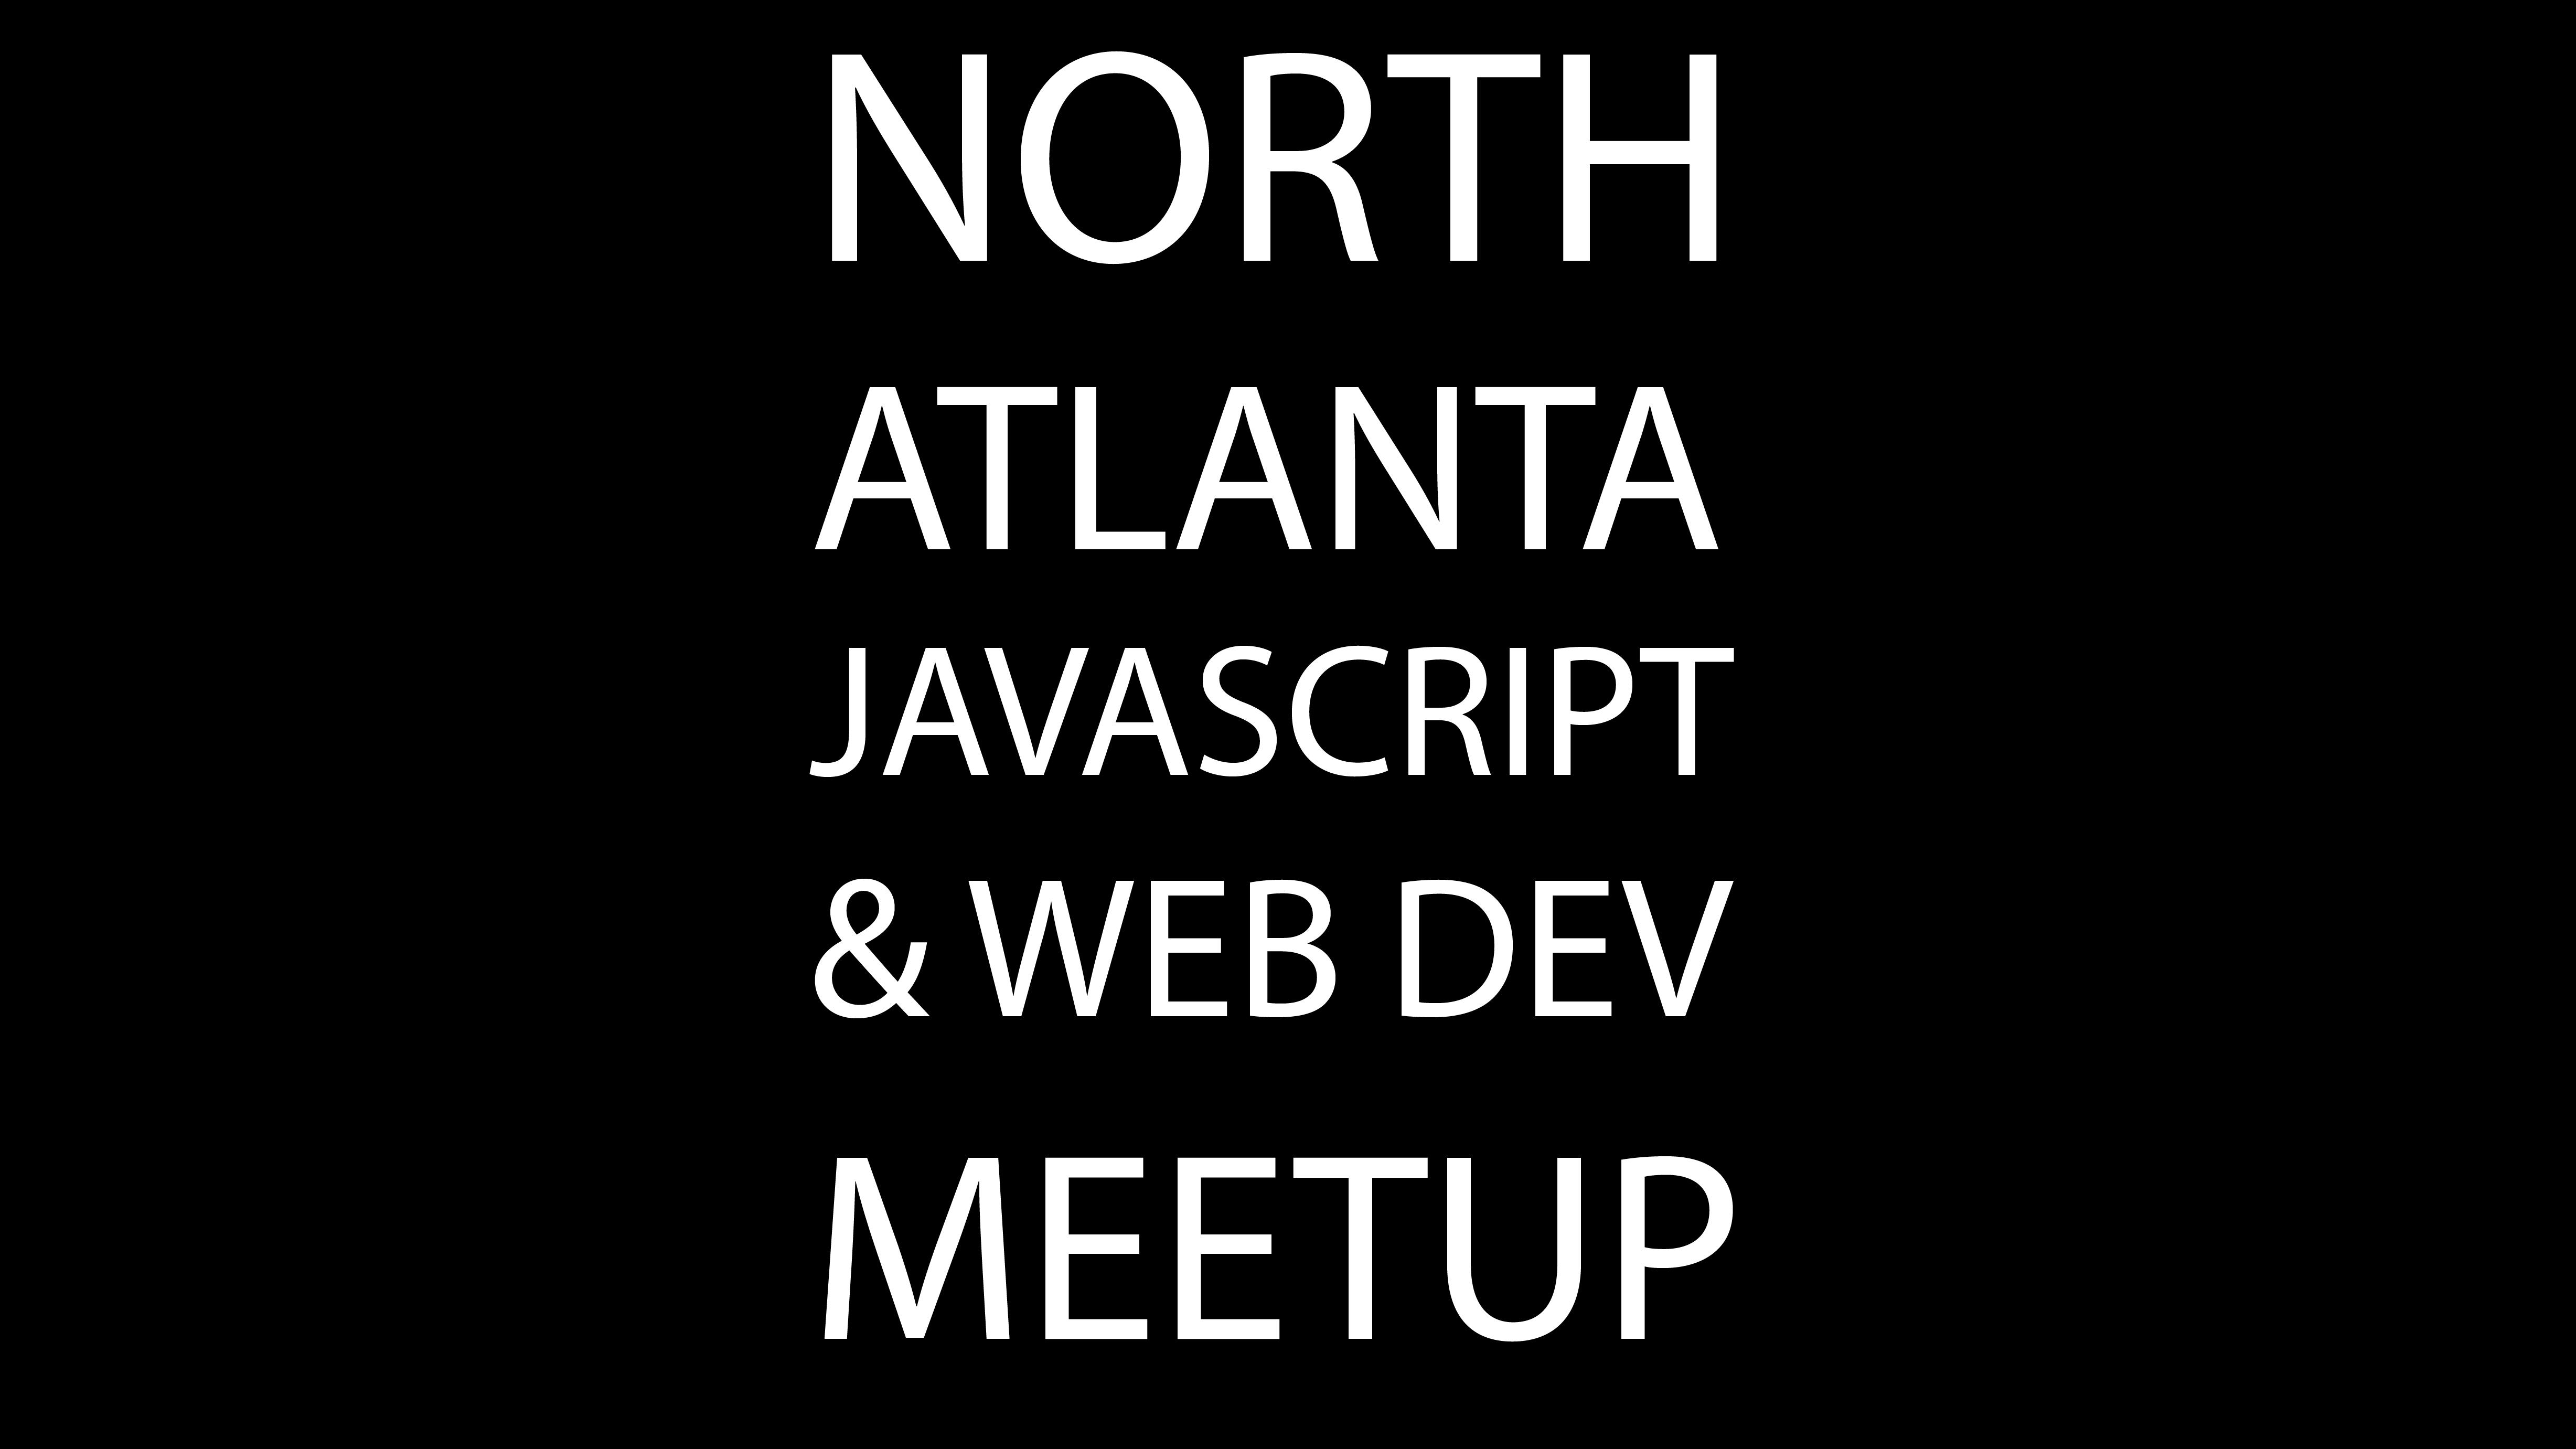 North Atlanta JavaScript and Web Dev